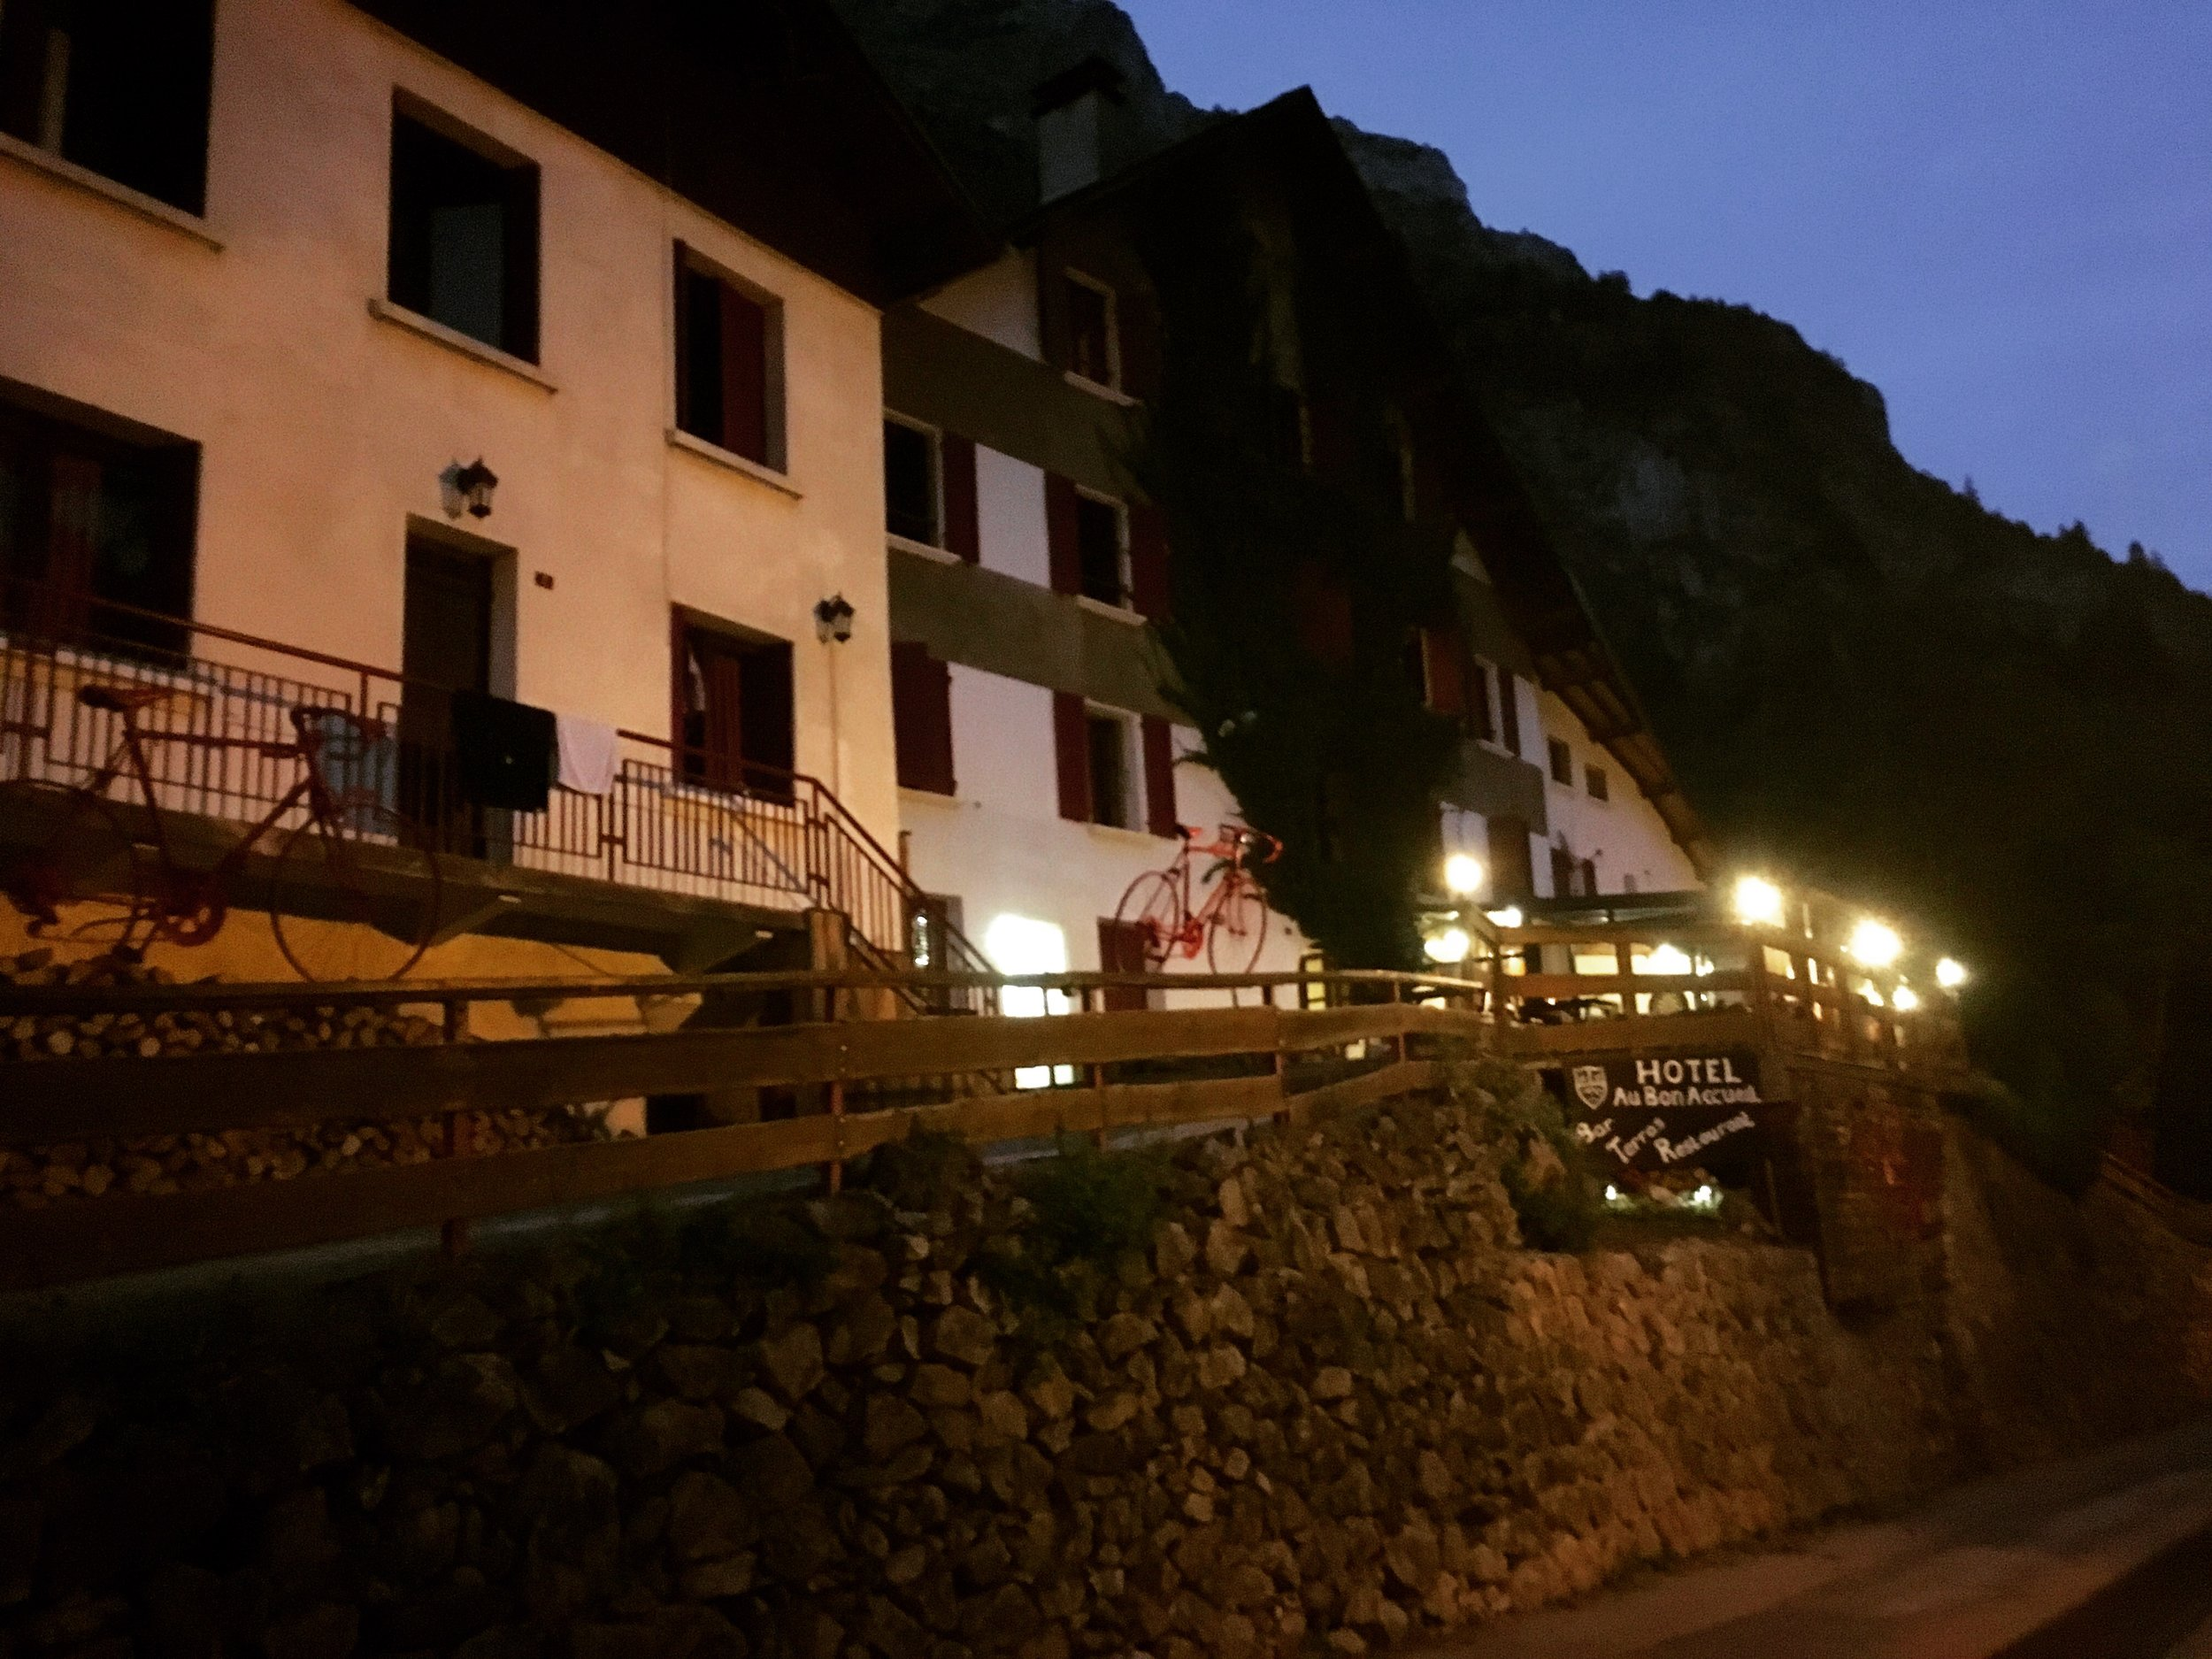 Hotel Nuit.JPG